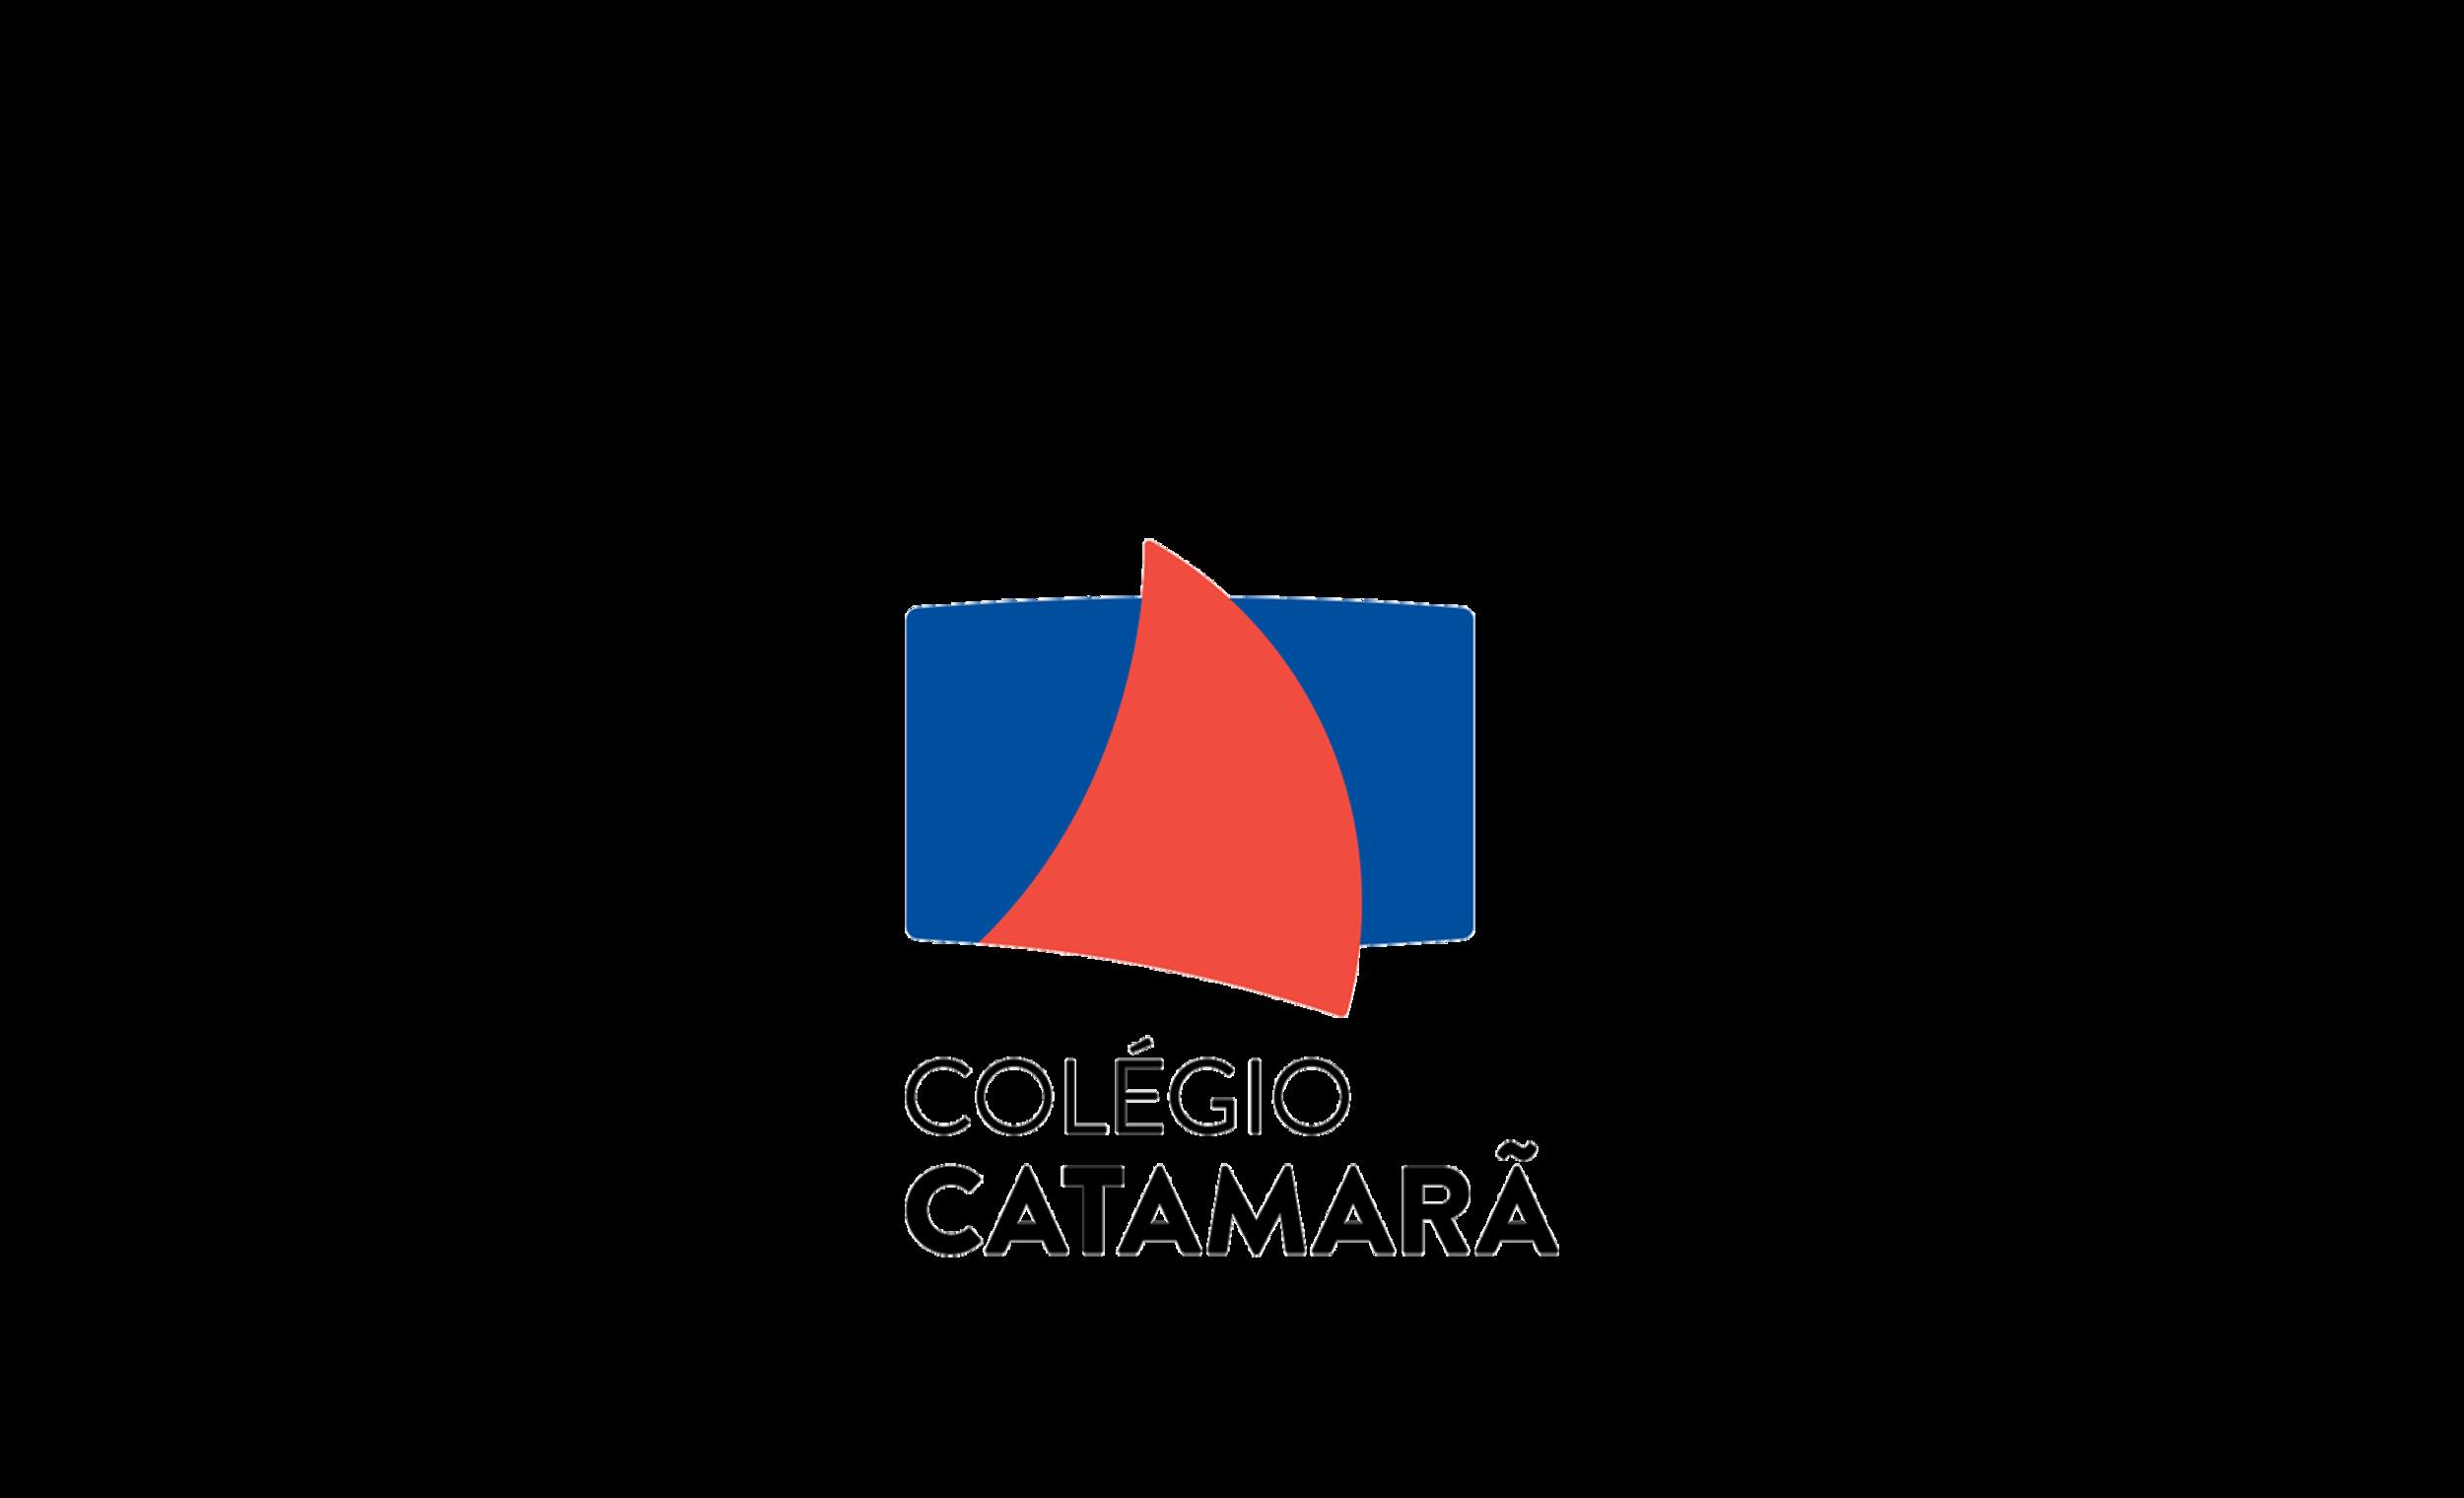 _0010_Catamarã.jpg.png